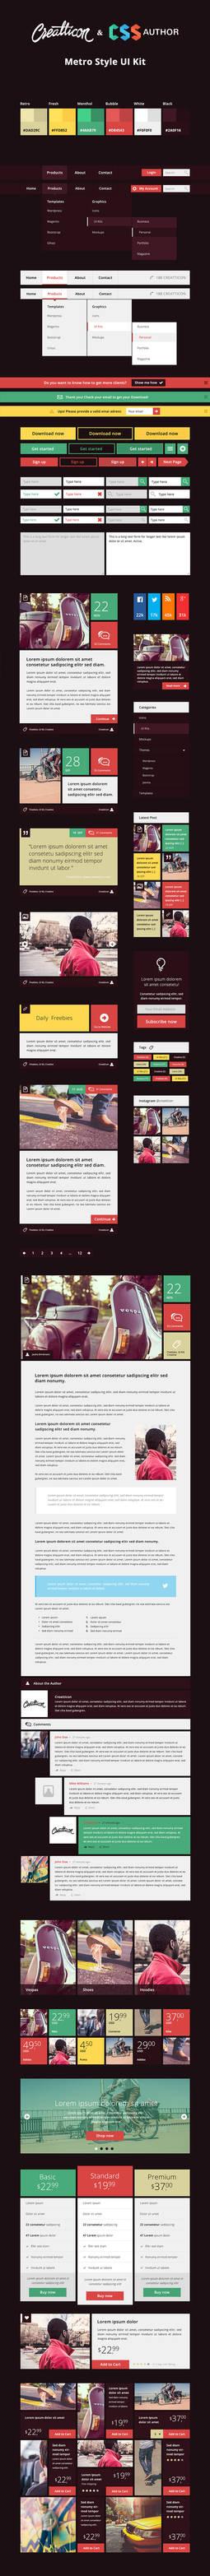 FREEBIE: Flat Metro Style UI Kit on CSS Author